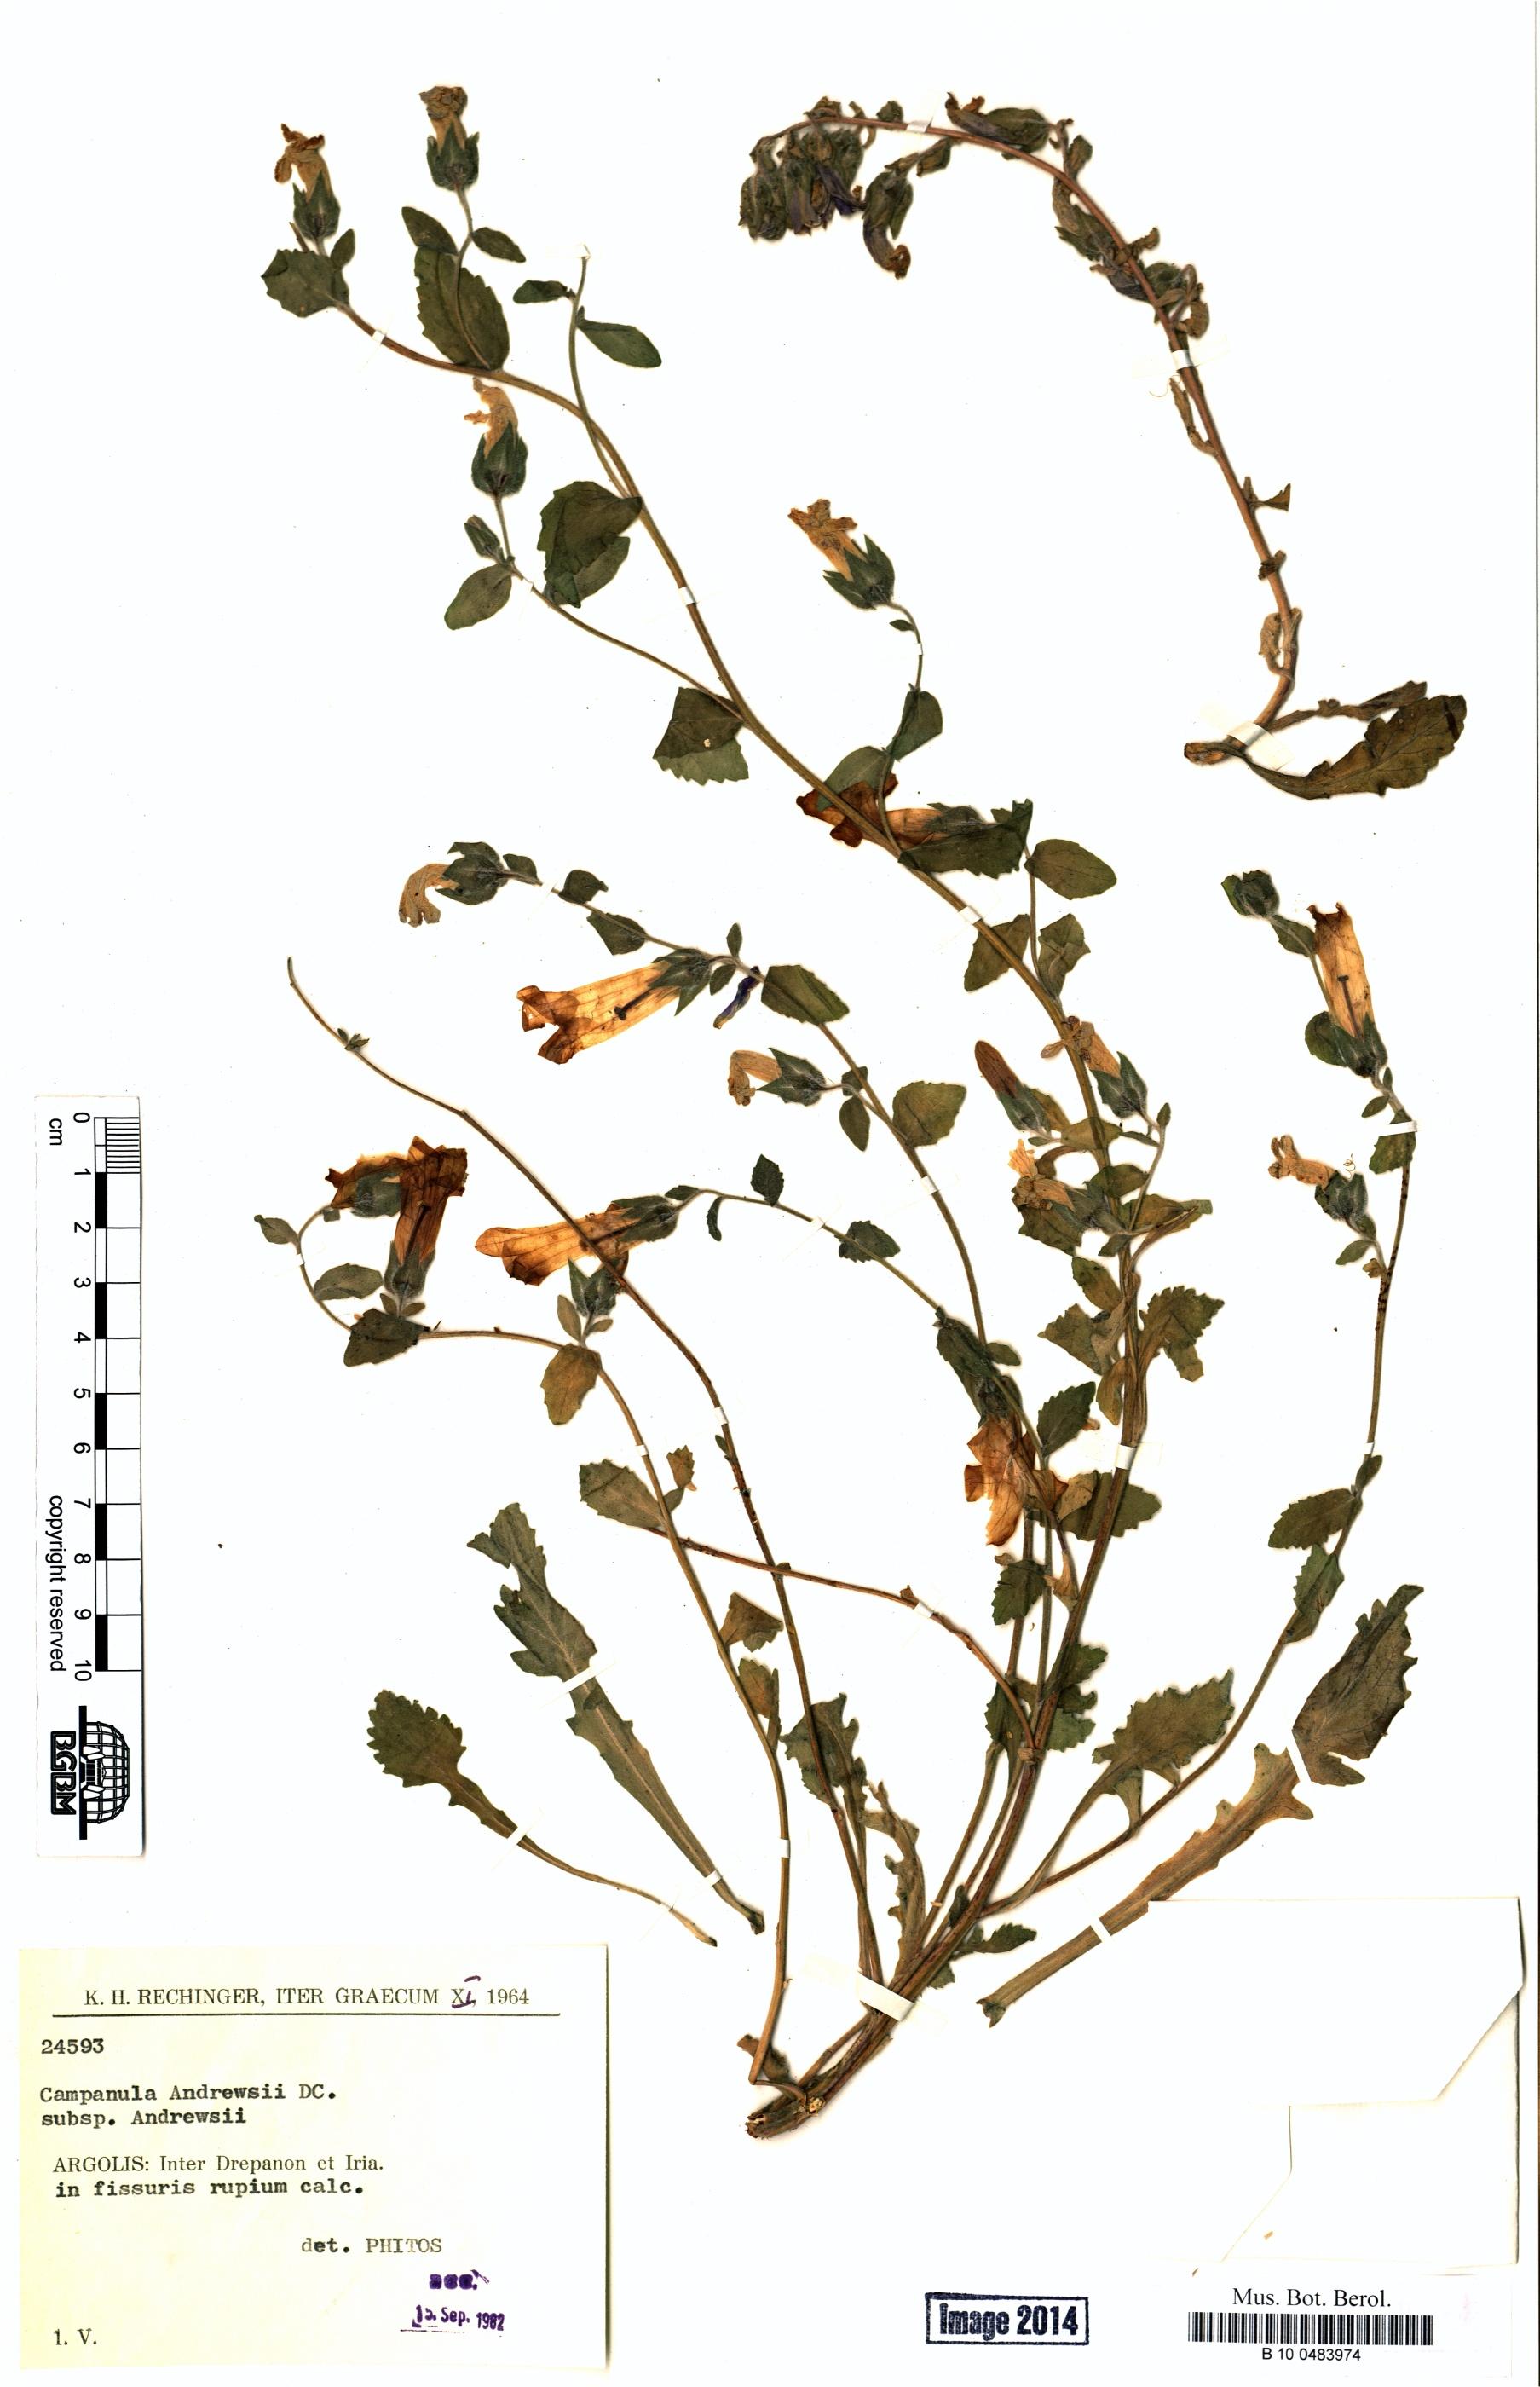 http://ww2.bgbm.org/herbarium/images/B/10/04/83/97/B_10_0483974.jpg